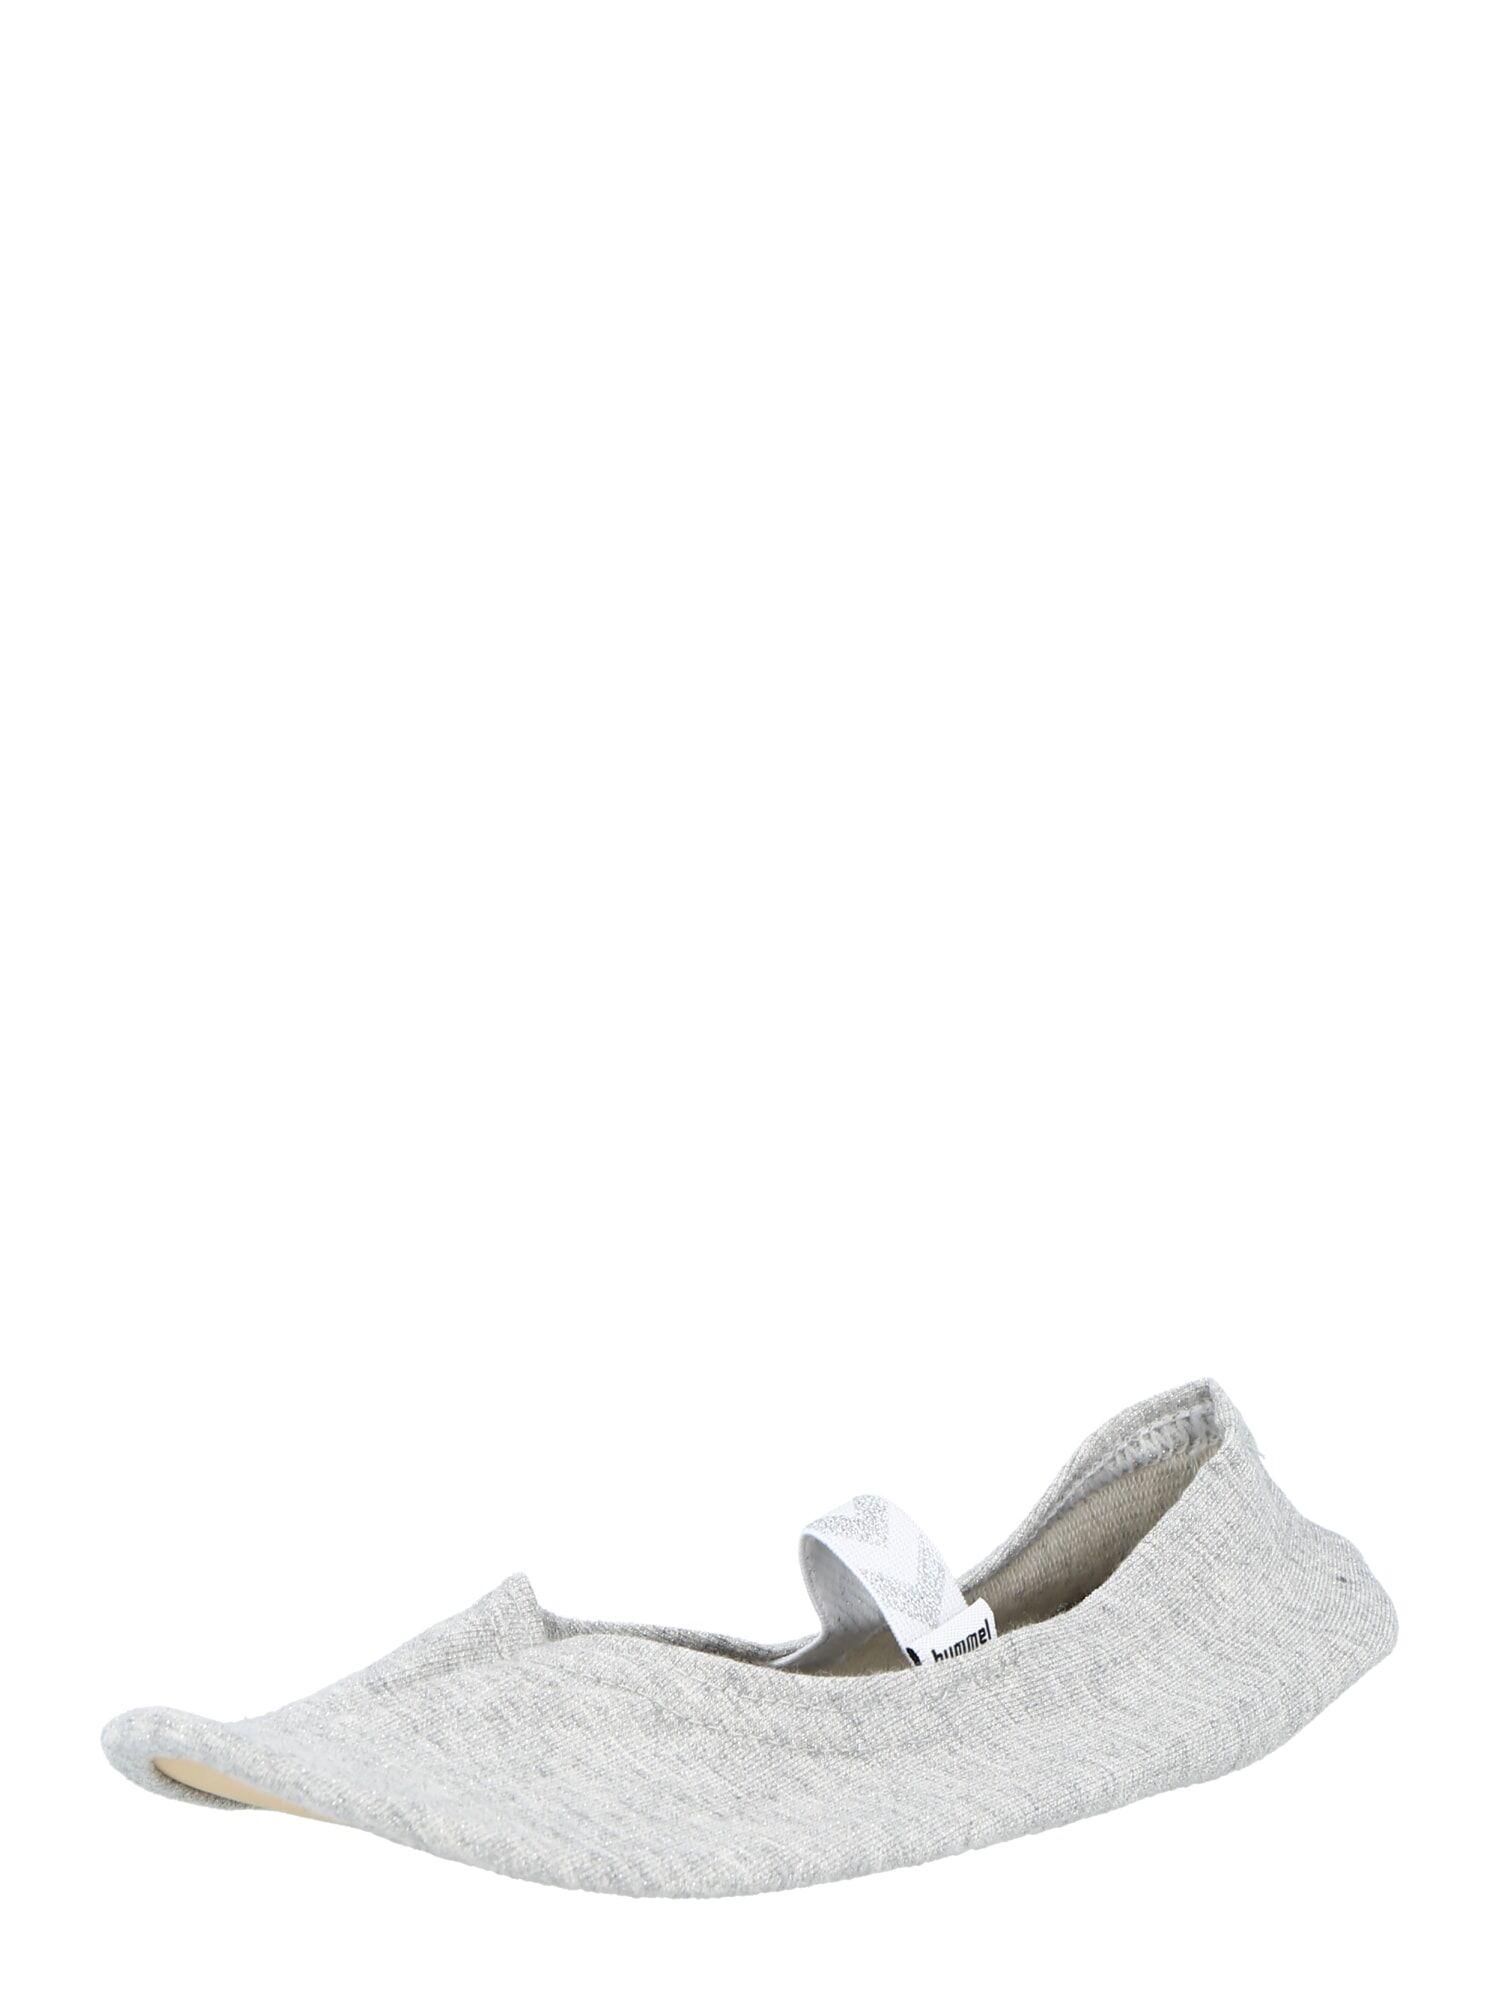 Hummel Chaussure de sport  - Gris - Taille: 25 - boy